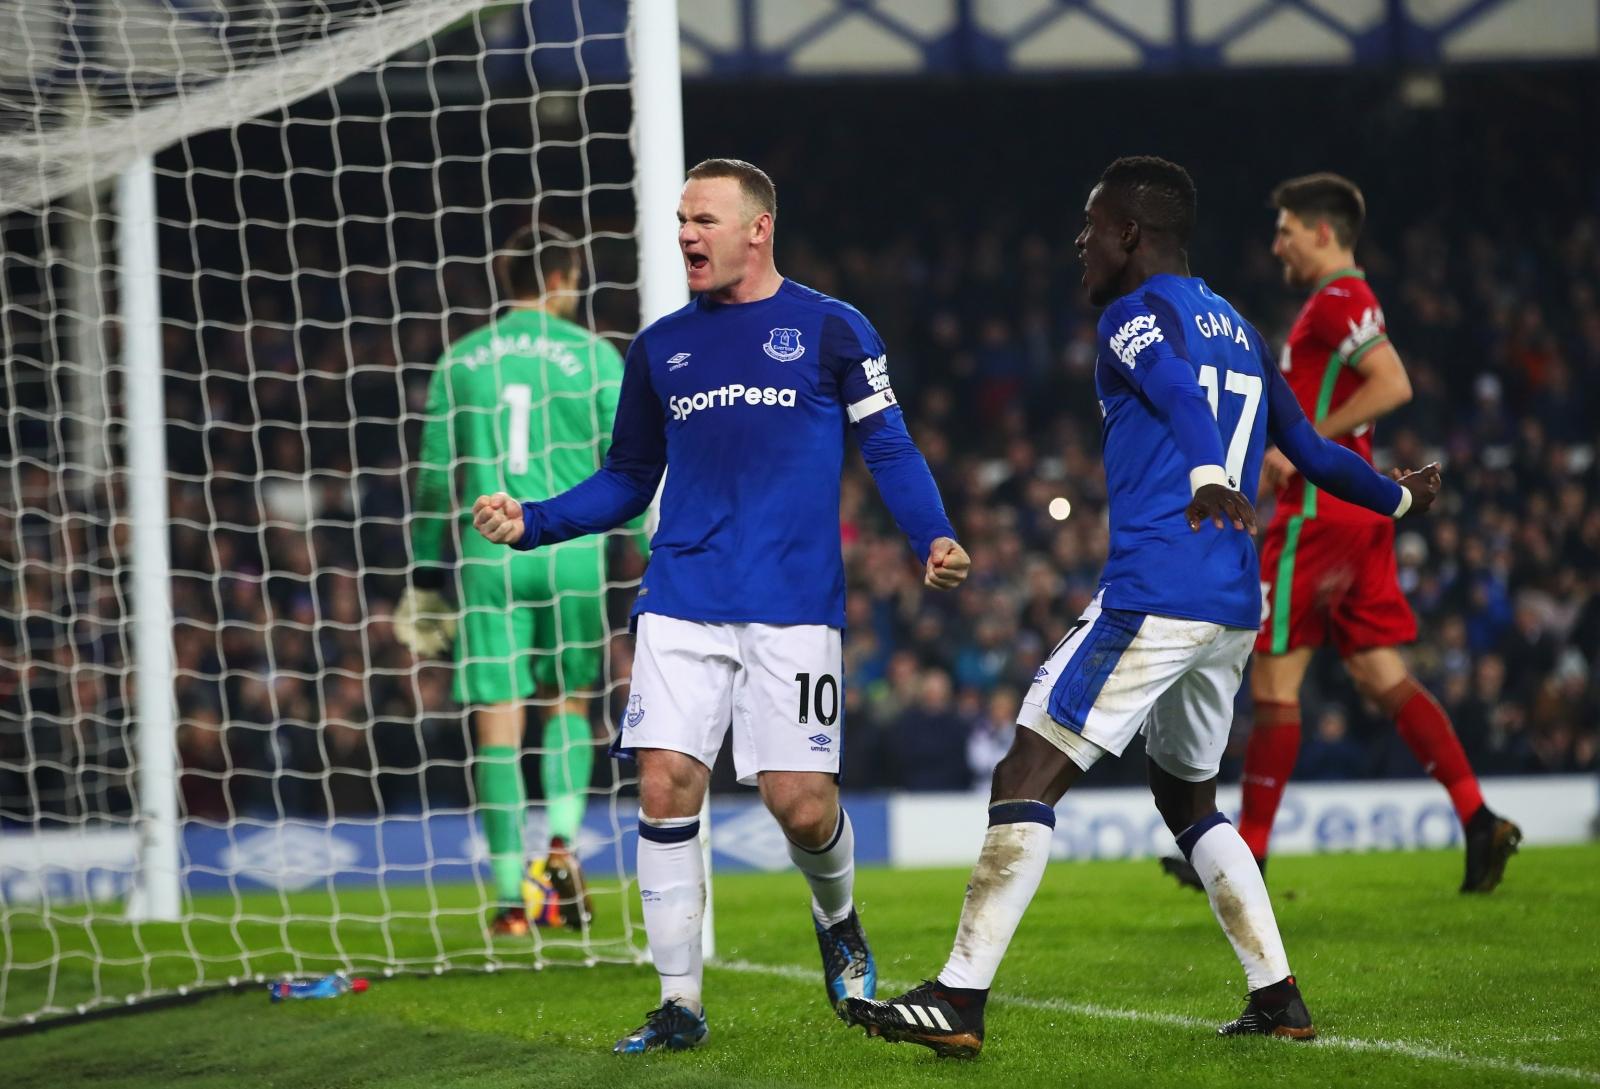 Bournemouth vs Everton Match Preview